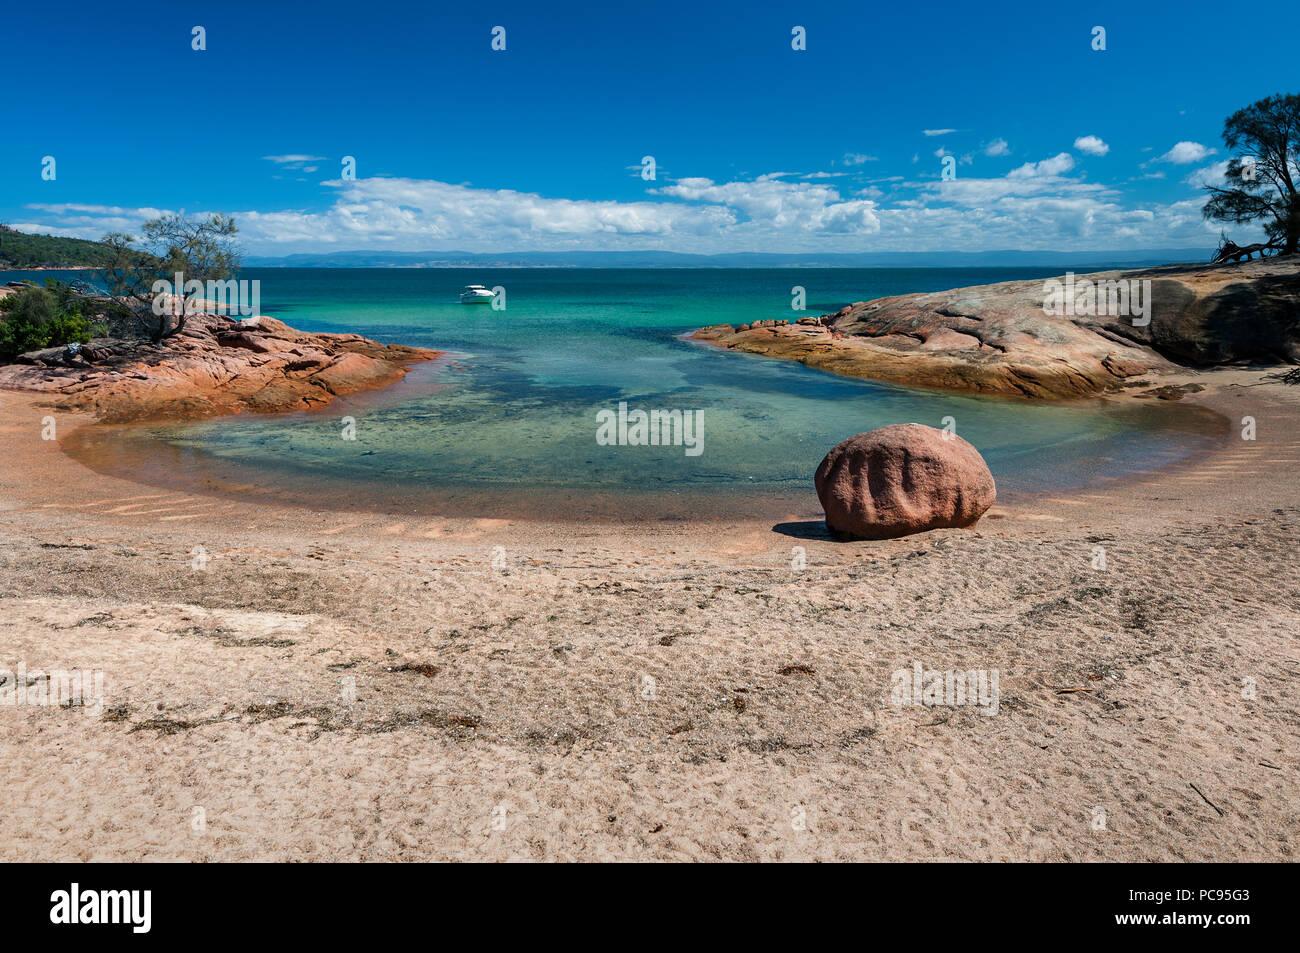 Honeymoon Bay in Freycinet National Park. - Stock Image